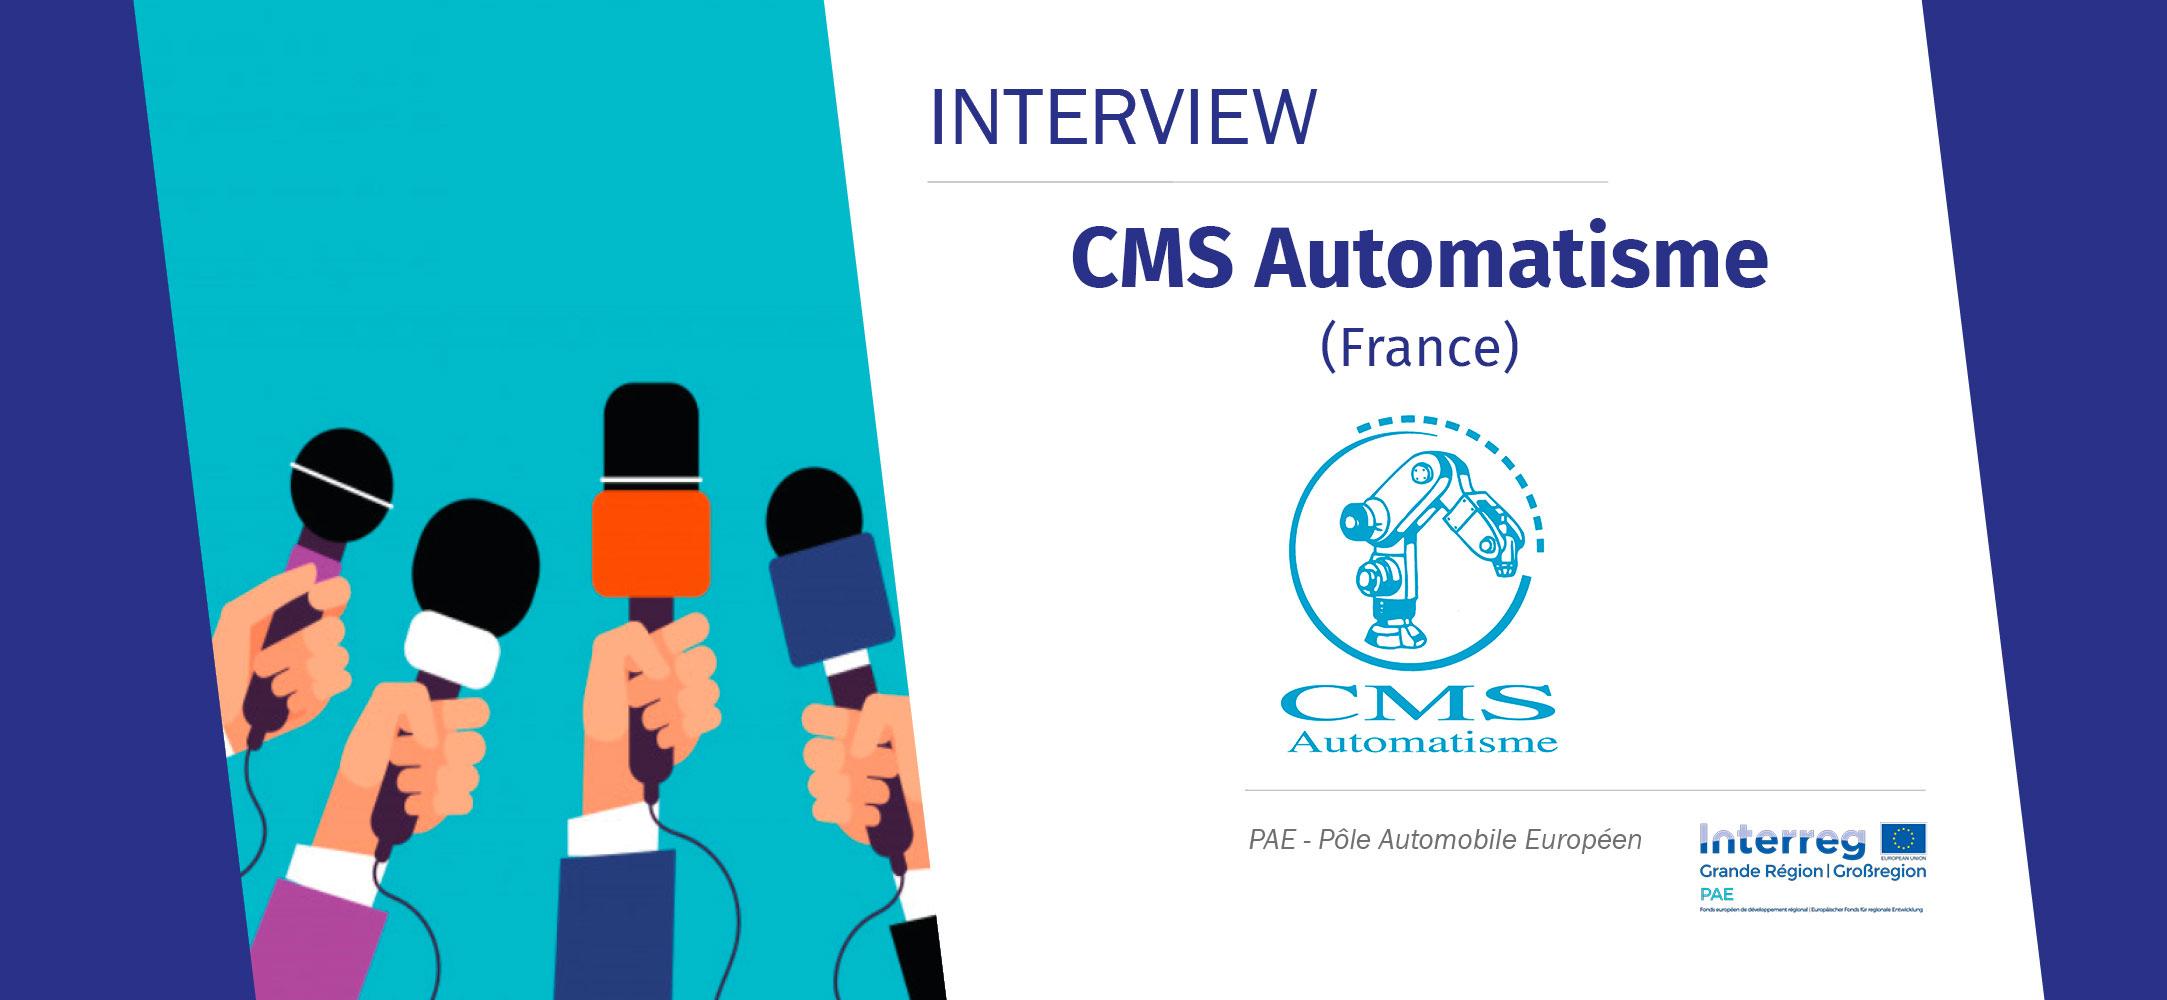 CMS Automatisme interview